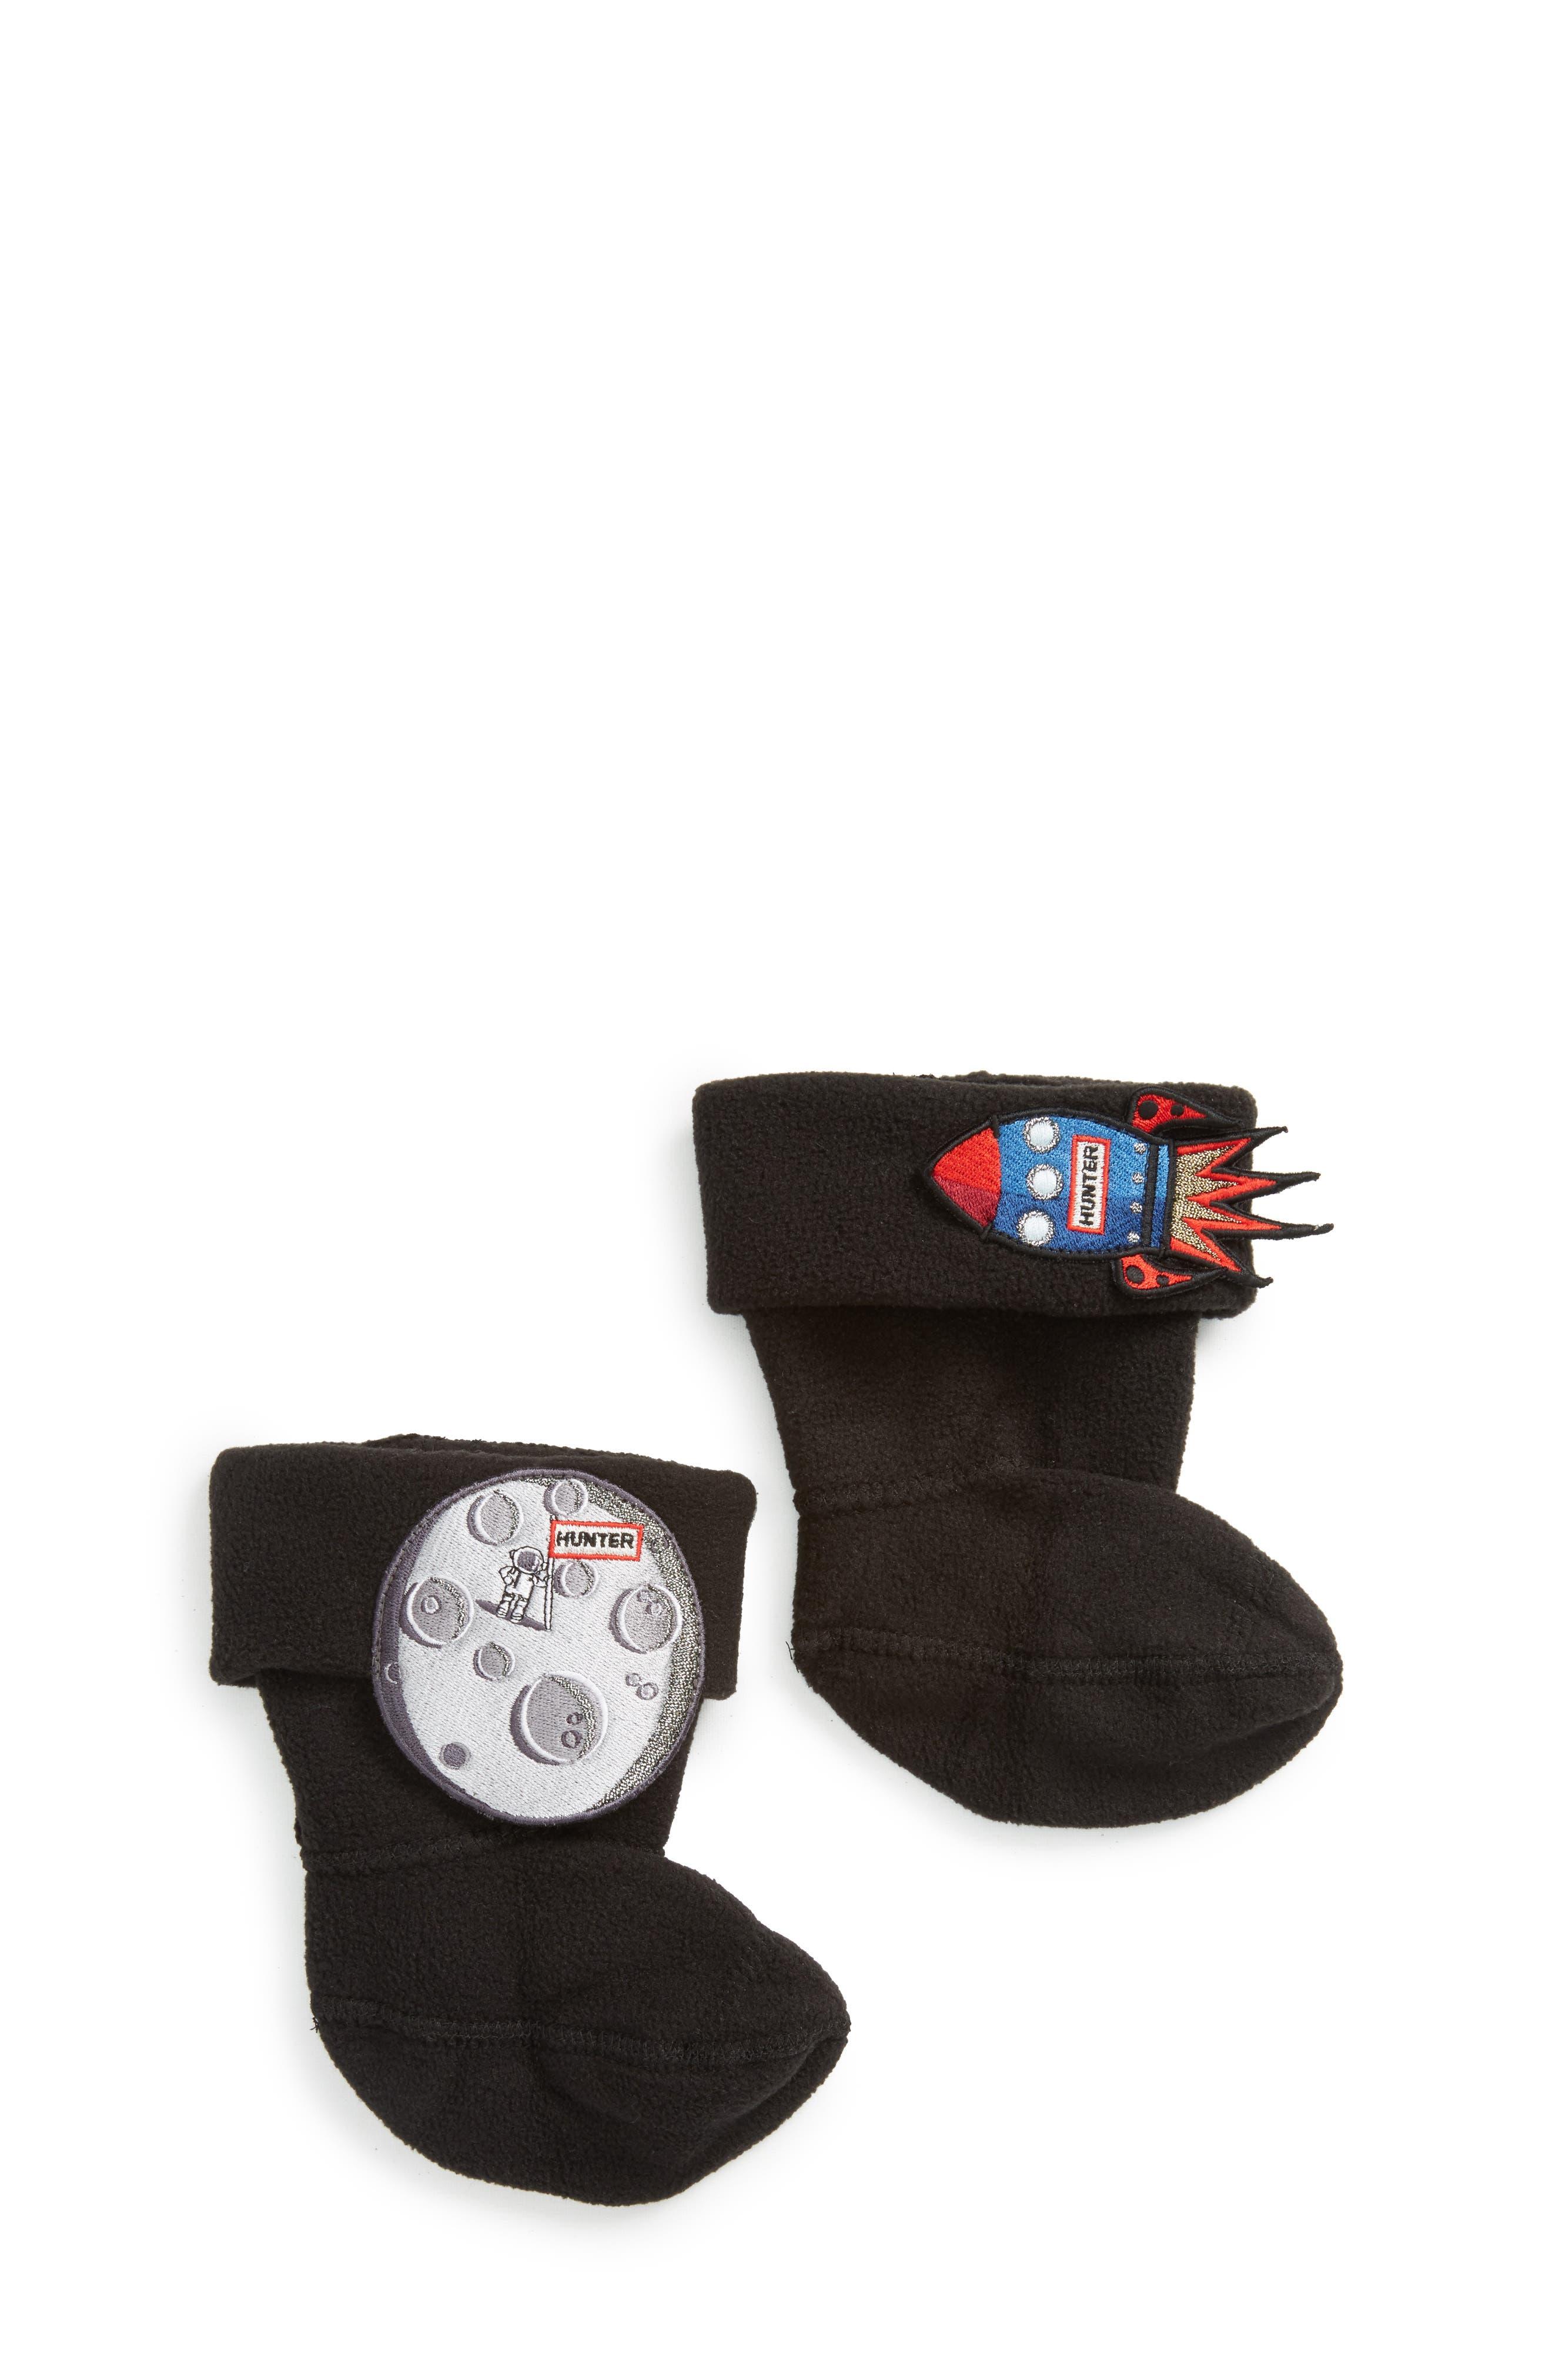 Main Image - Hunter Spaceship/Moon Boot Socks (Walker, Toddler & Little Kid)